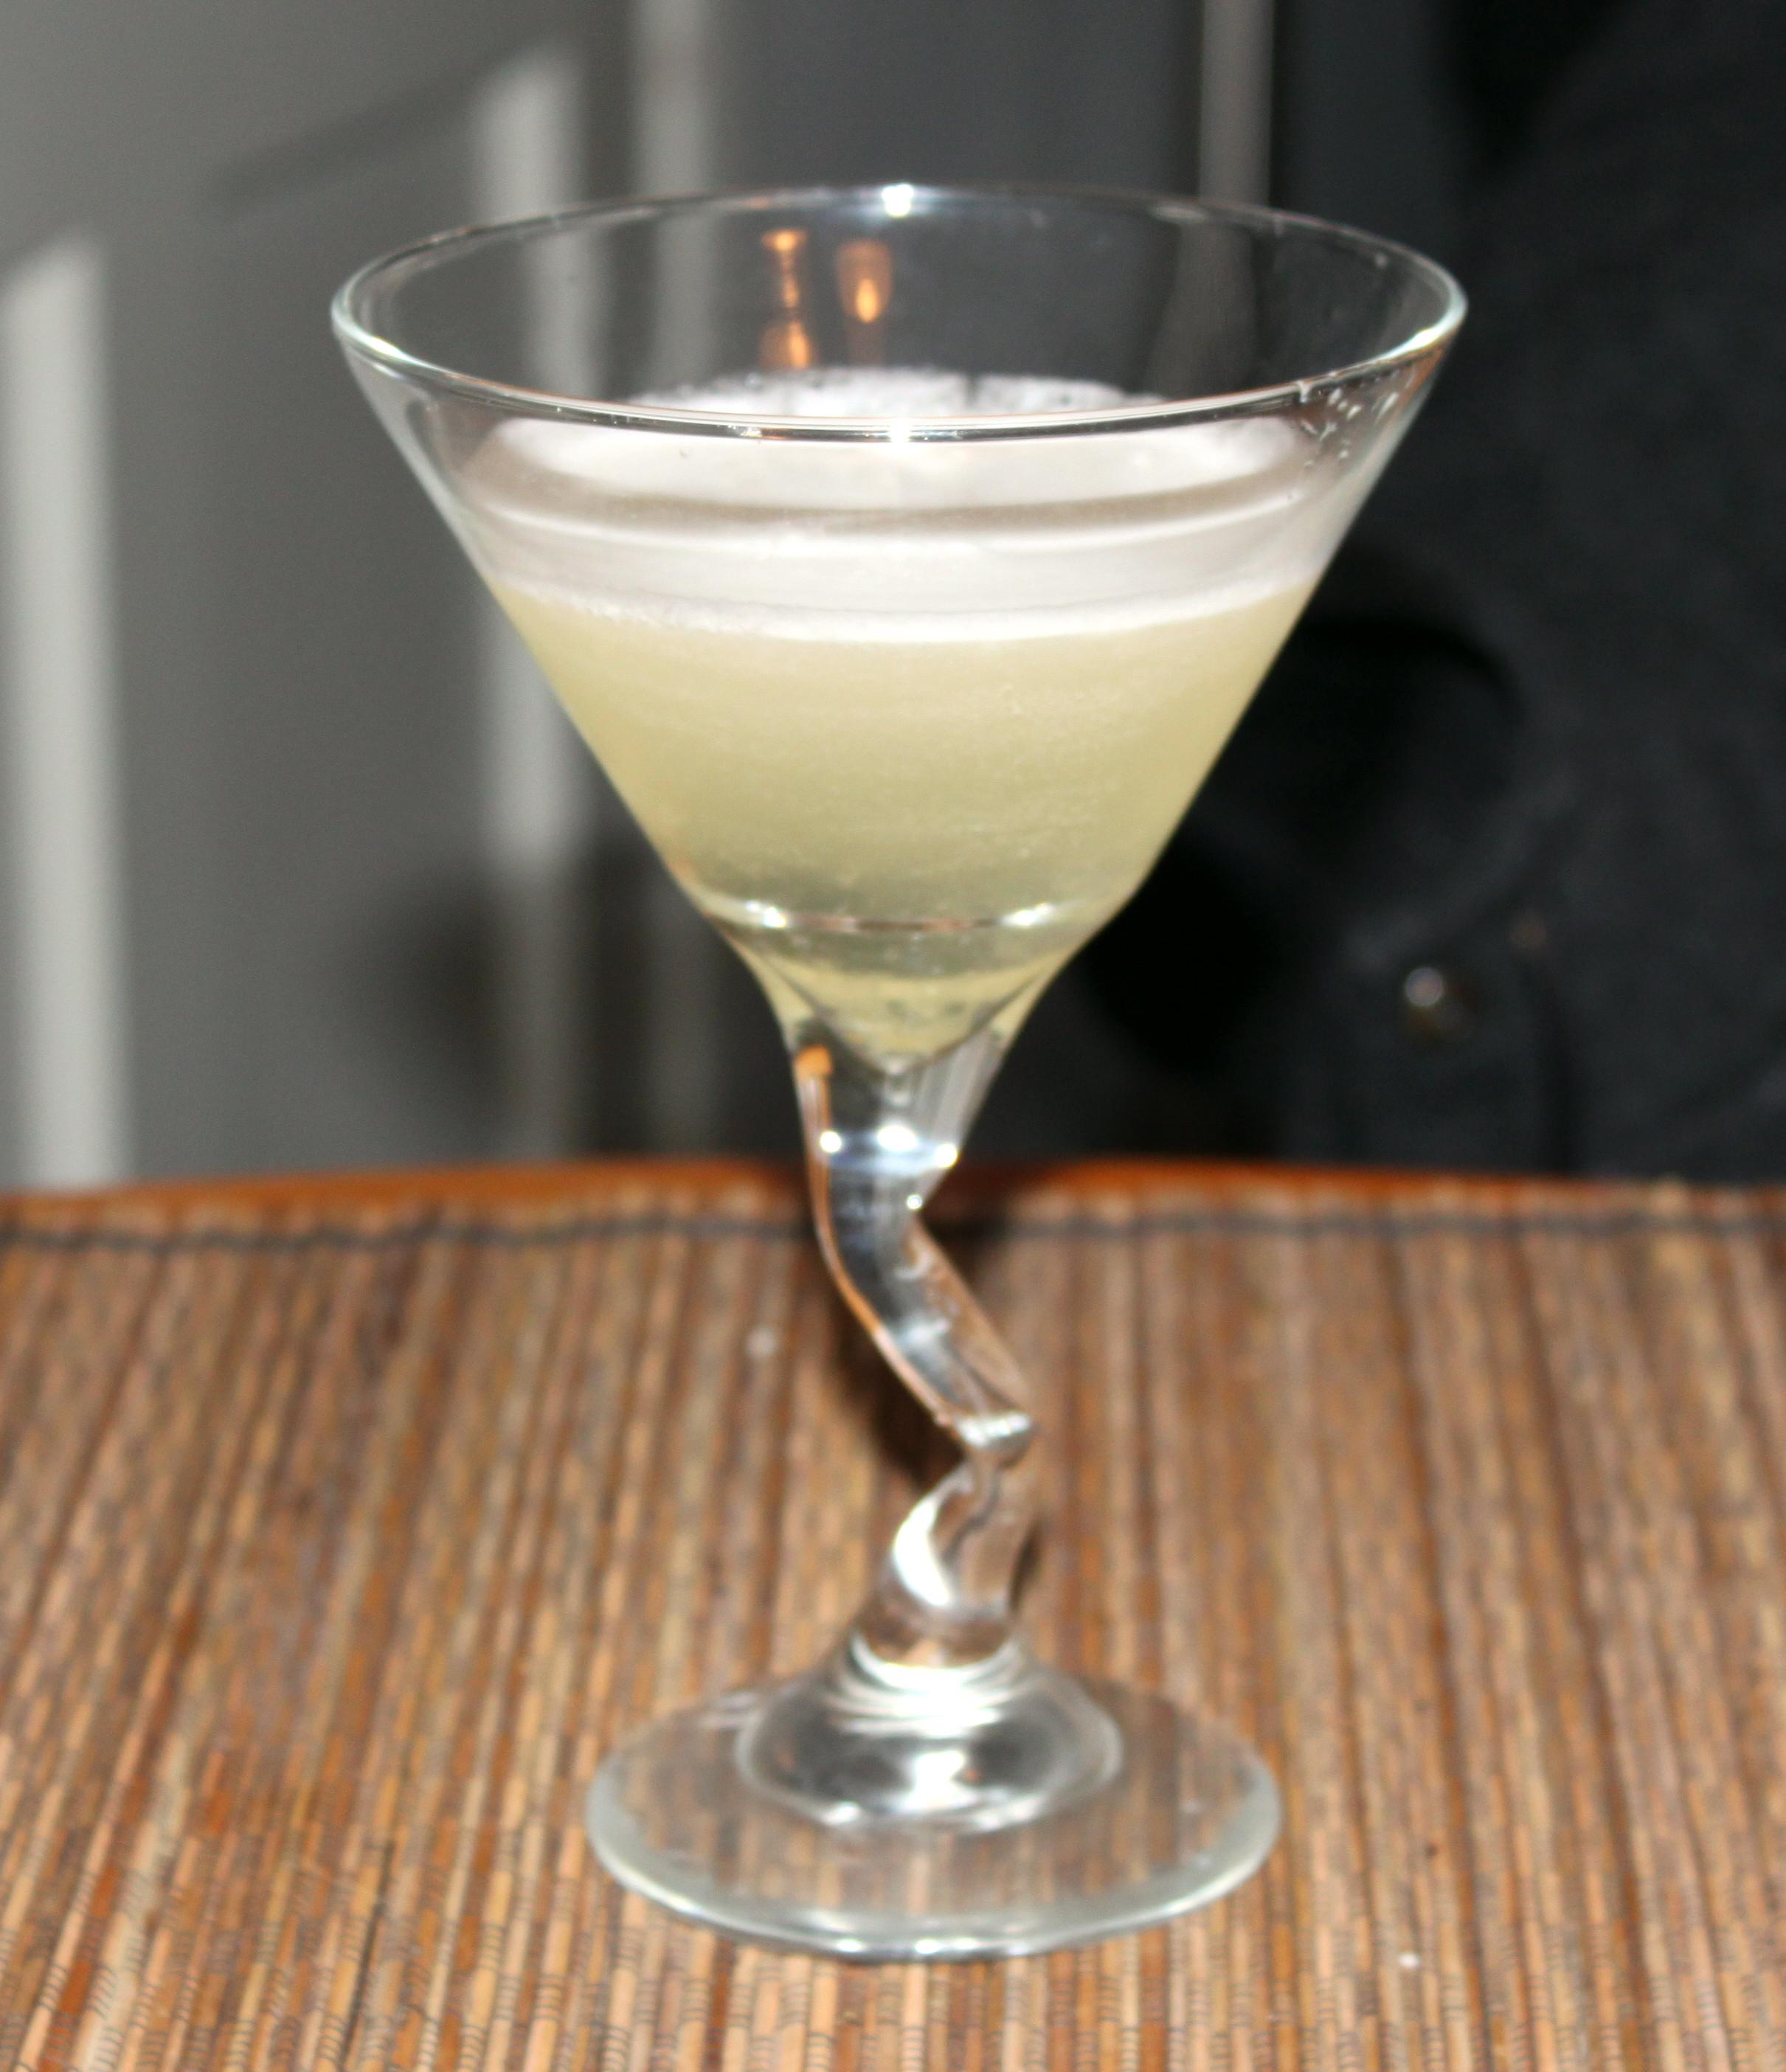 Vodka And Pineapple Juice Drinks  Easy Homemade Pineapple Vodka